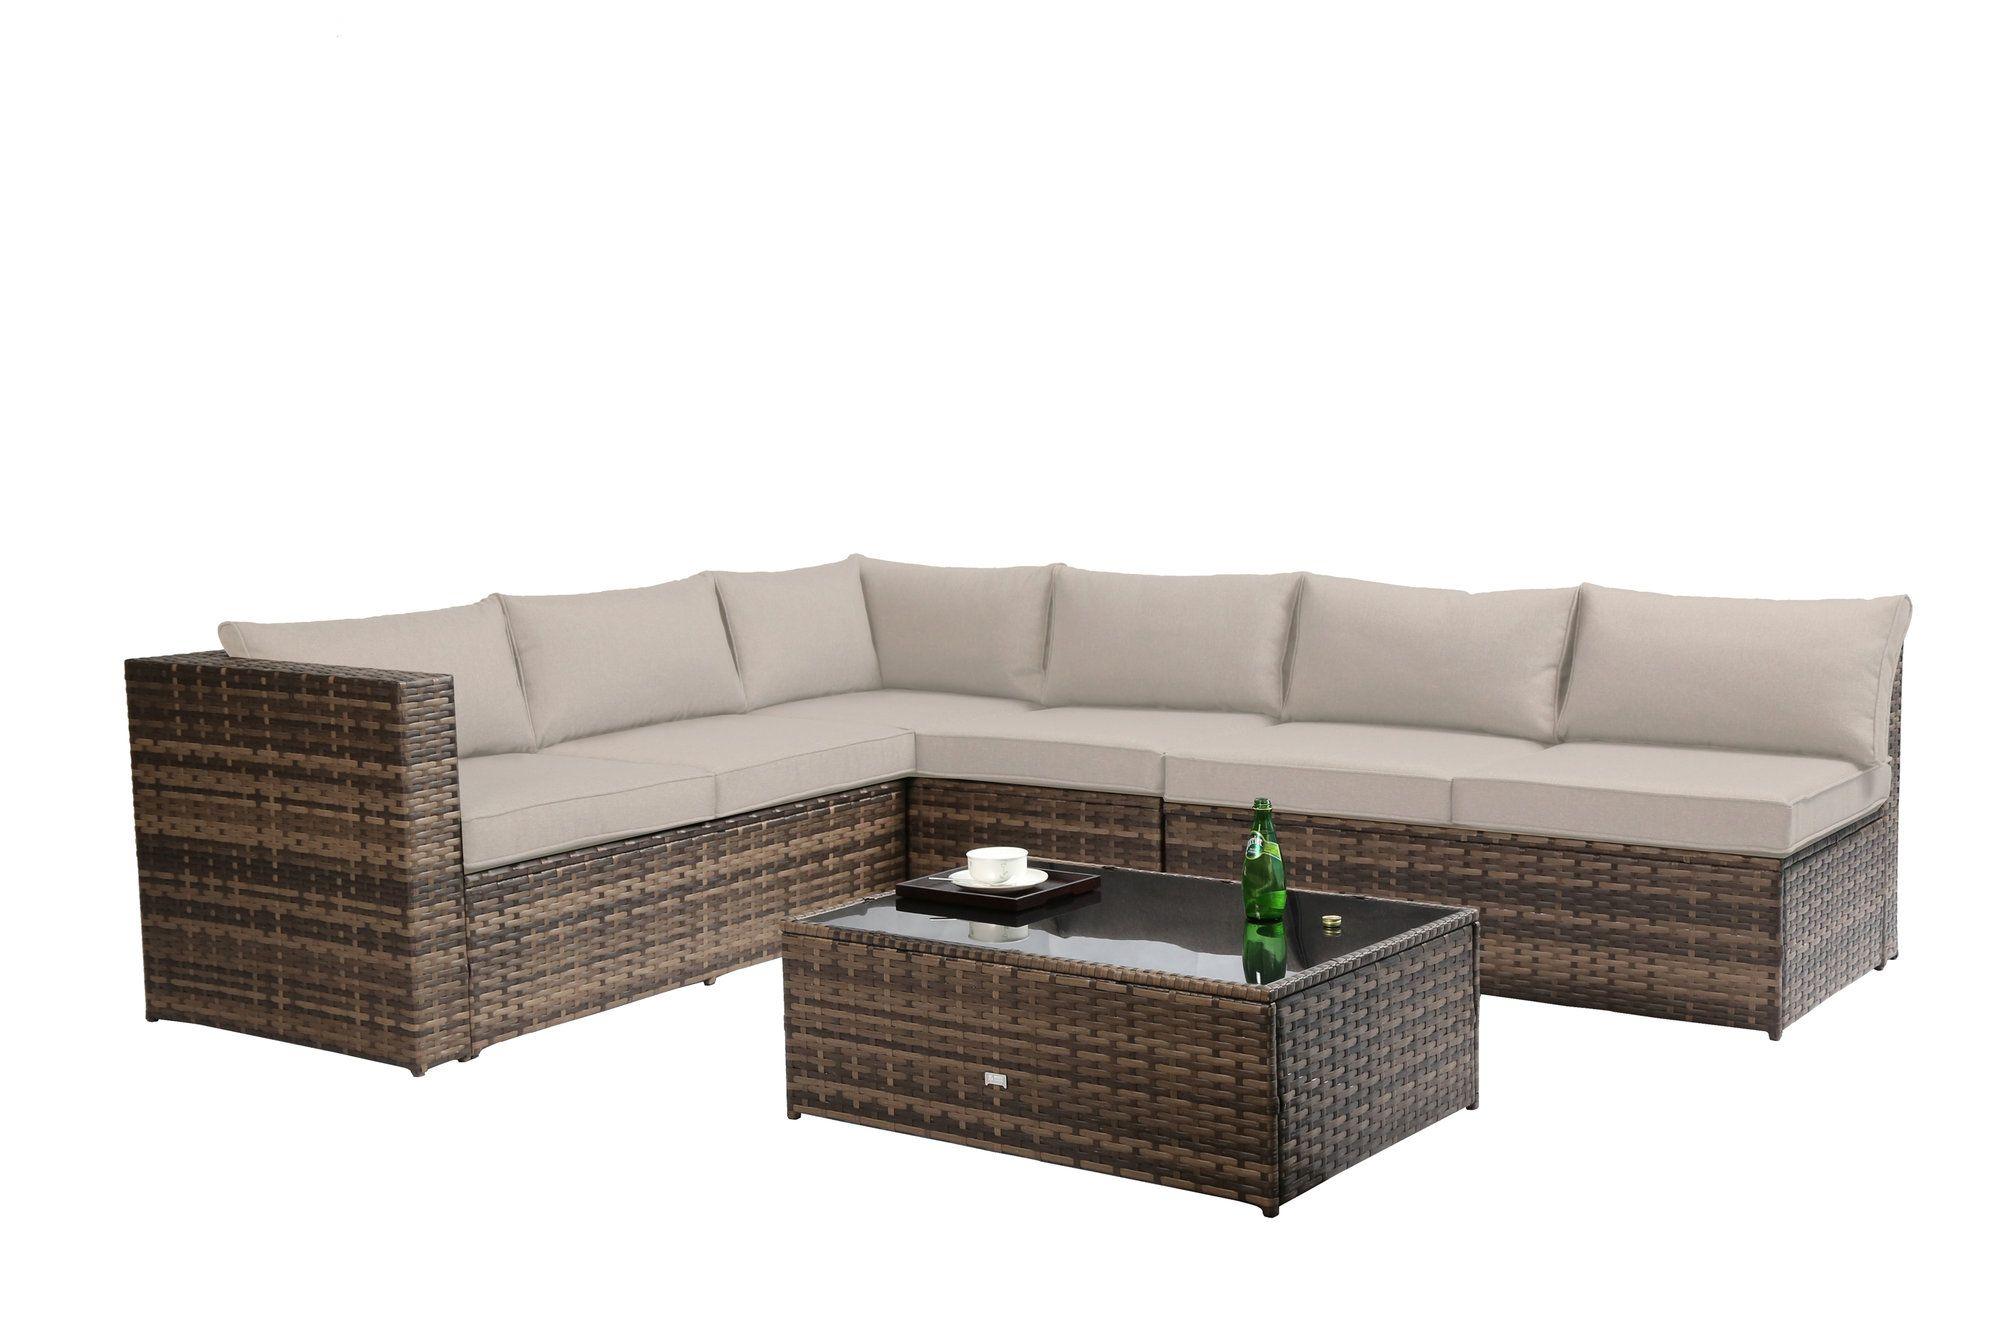 fewell 5 piece sofa set with cushions products sofa set rh pinterest com